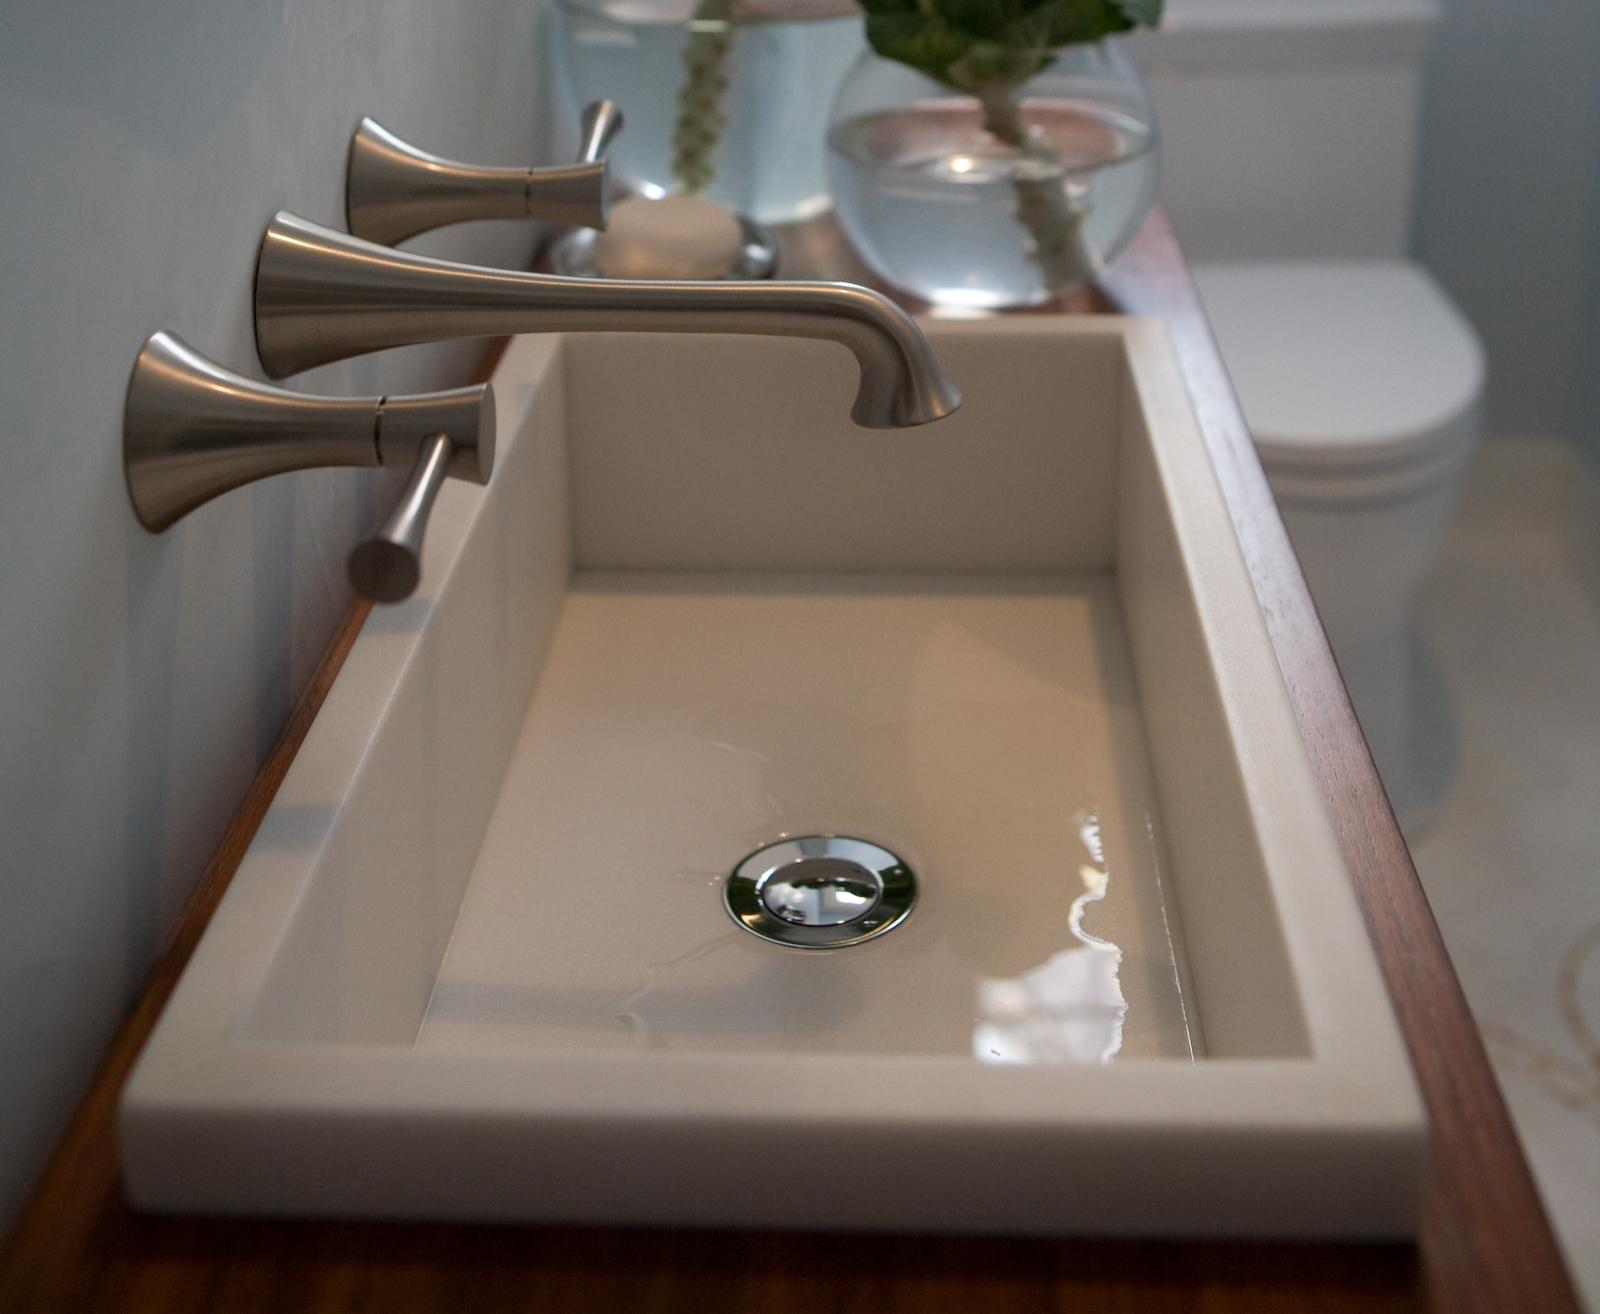 sink, modern, white, clean, bathroom, wood, porcelain, elegant